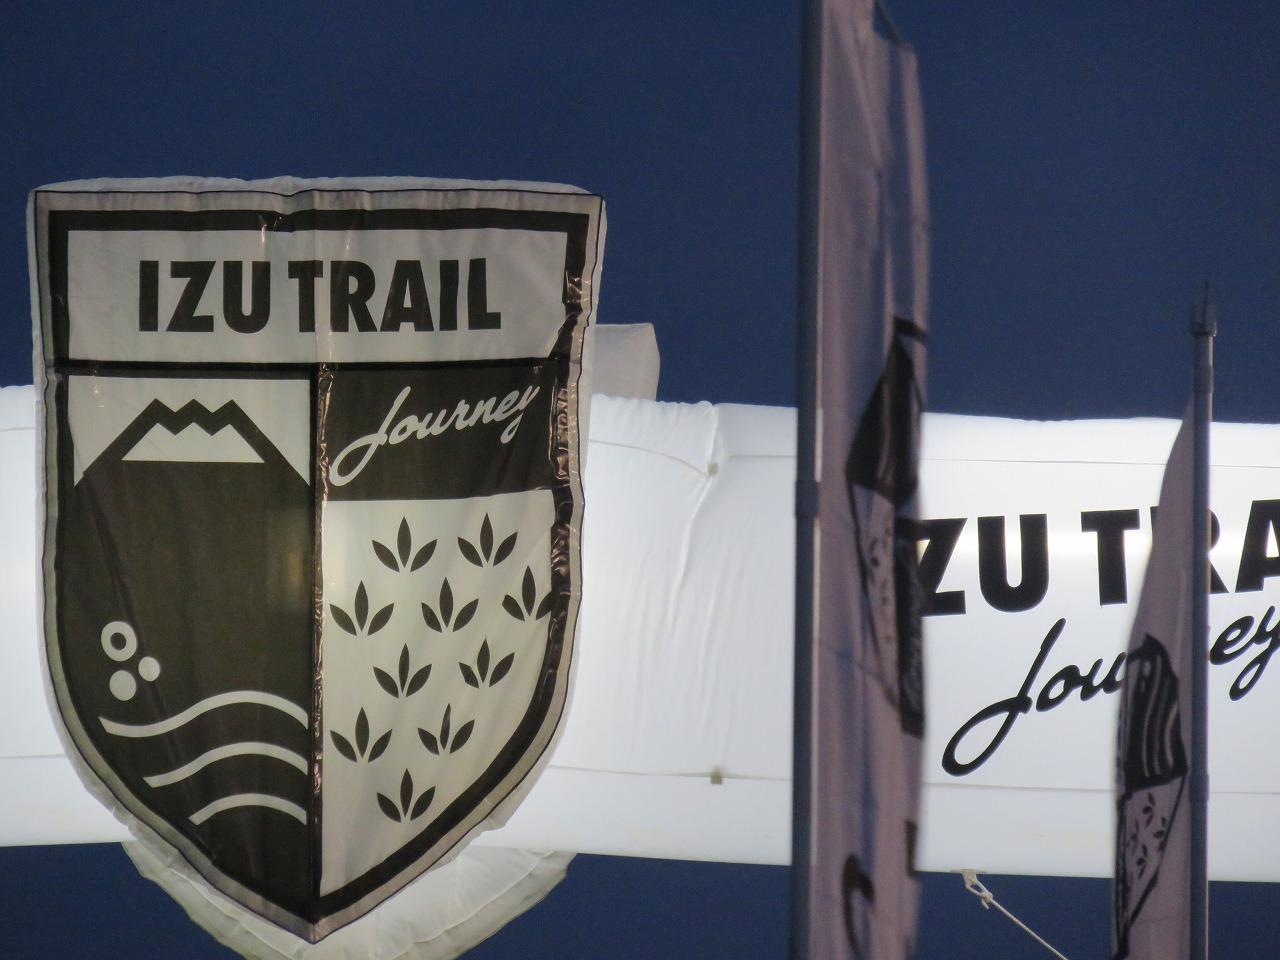 IZU TRAIL1